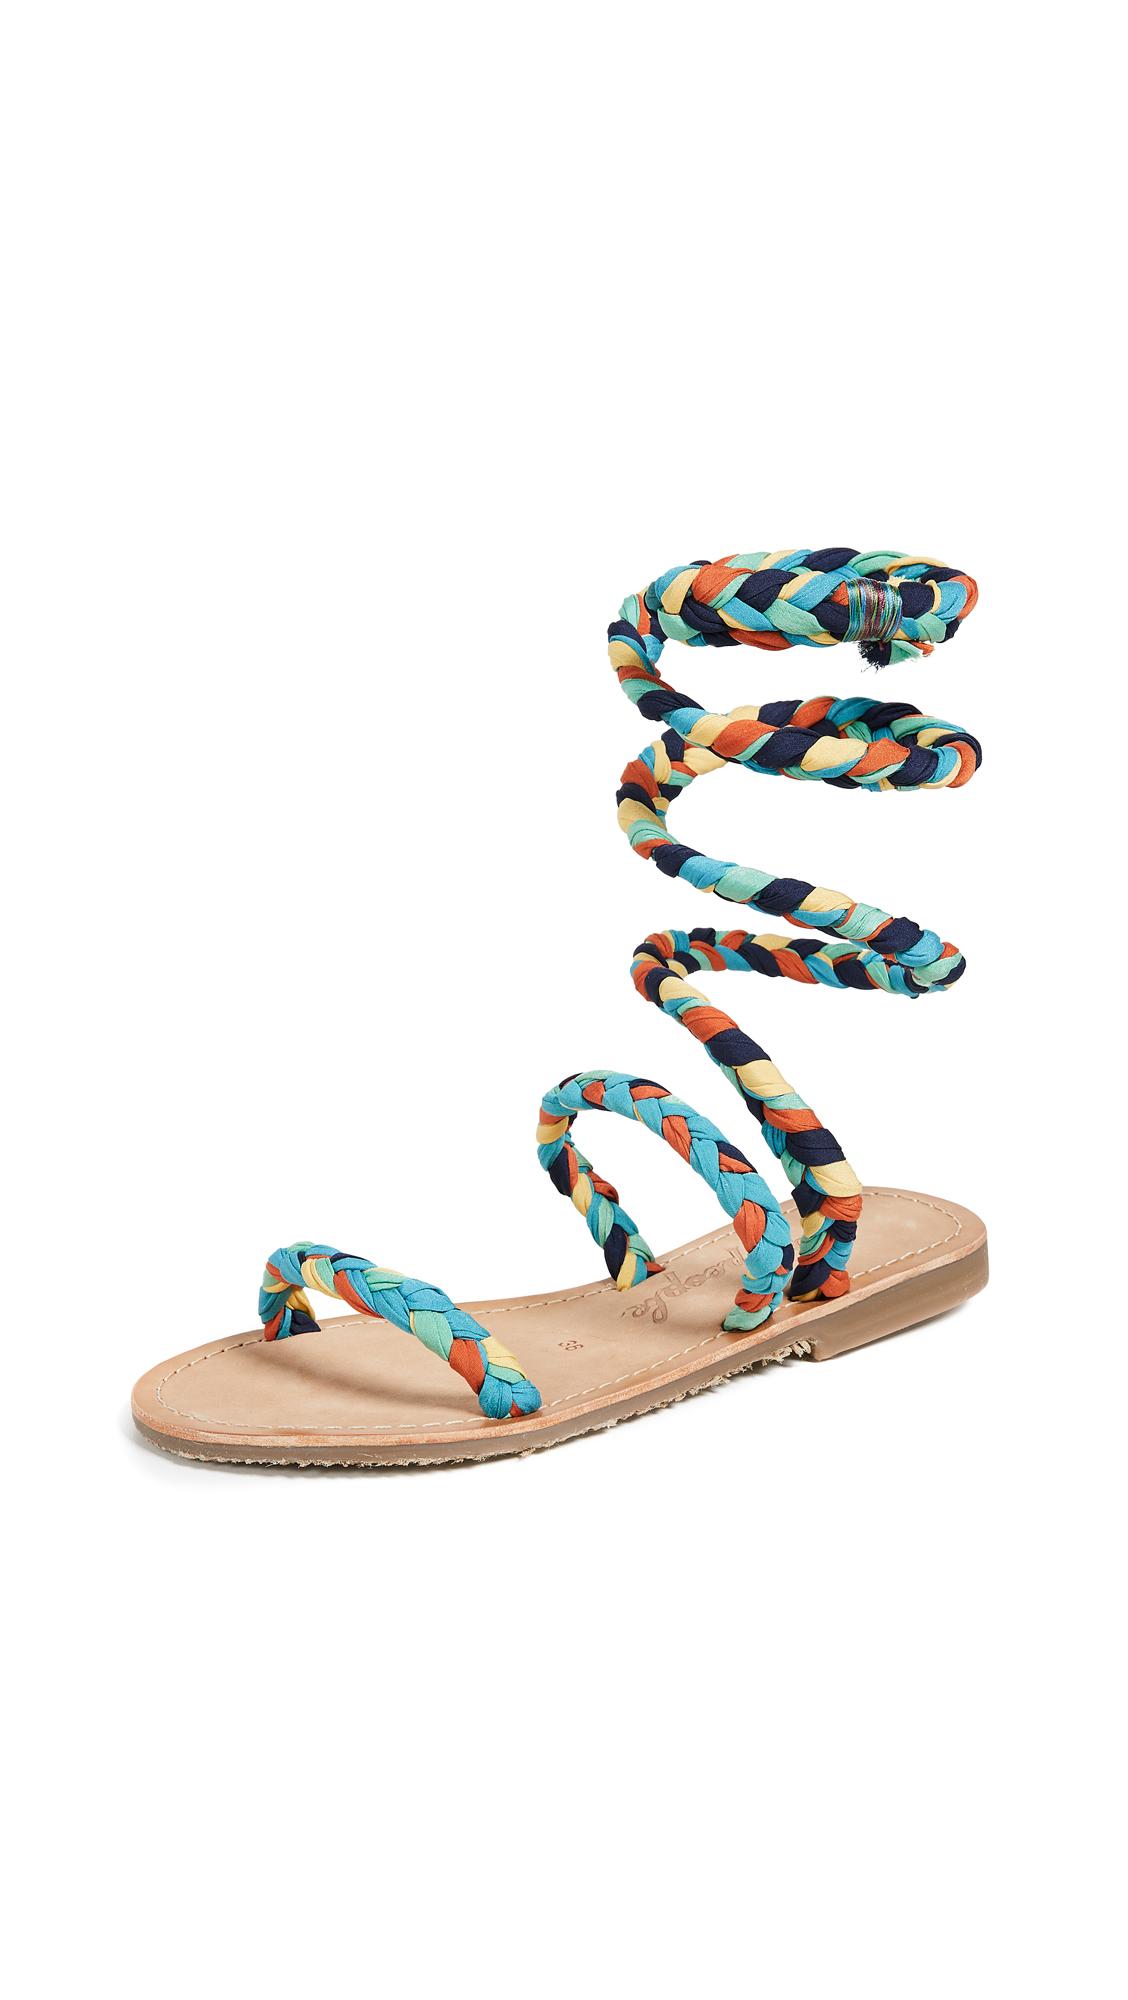 Free People Embellished Havana Gladiator Sandals